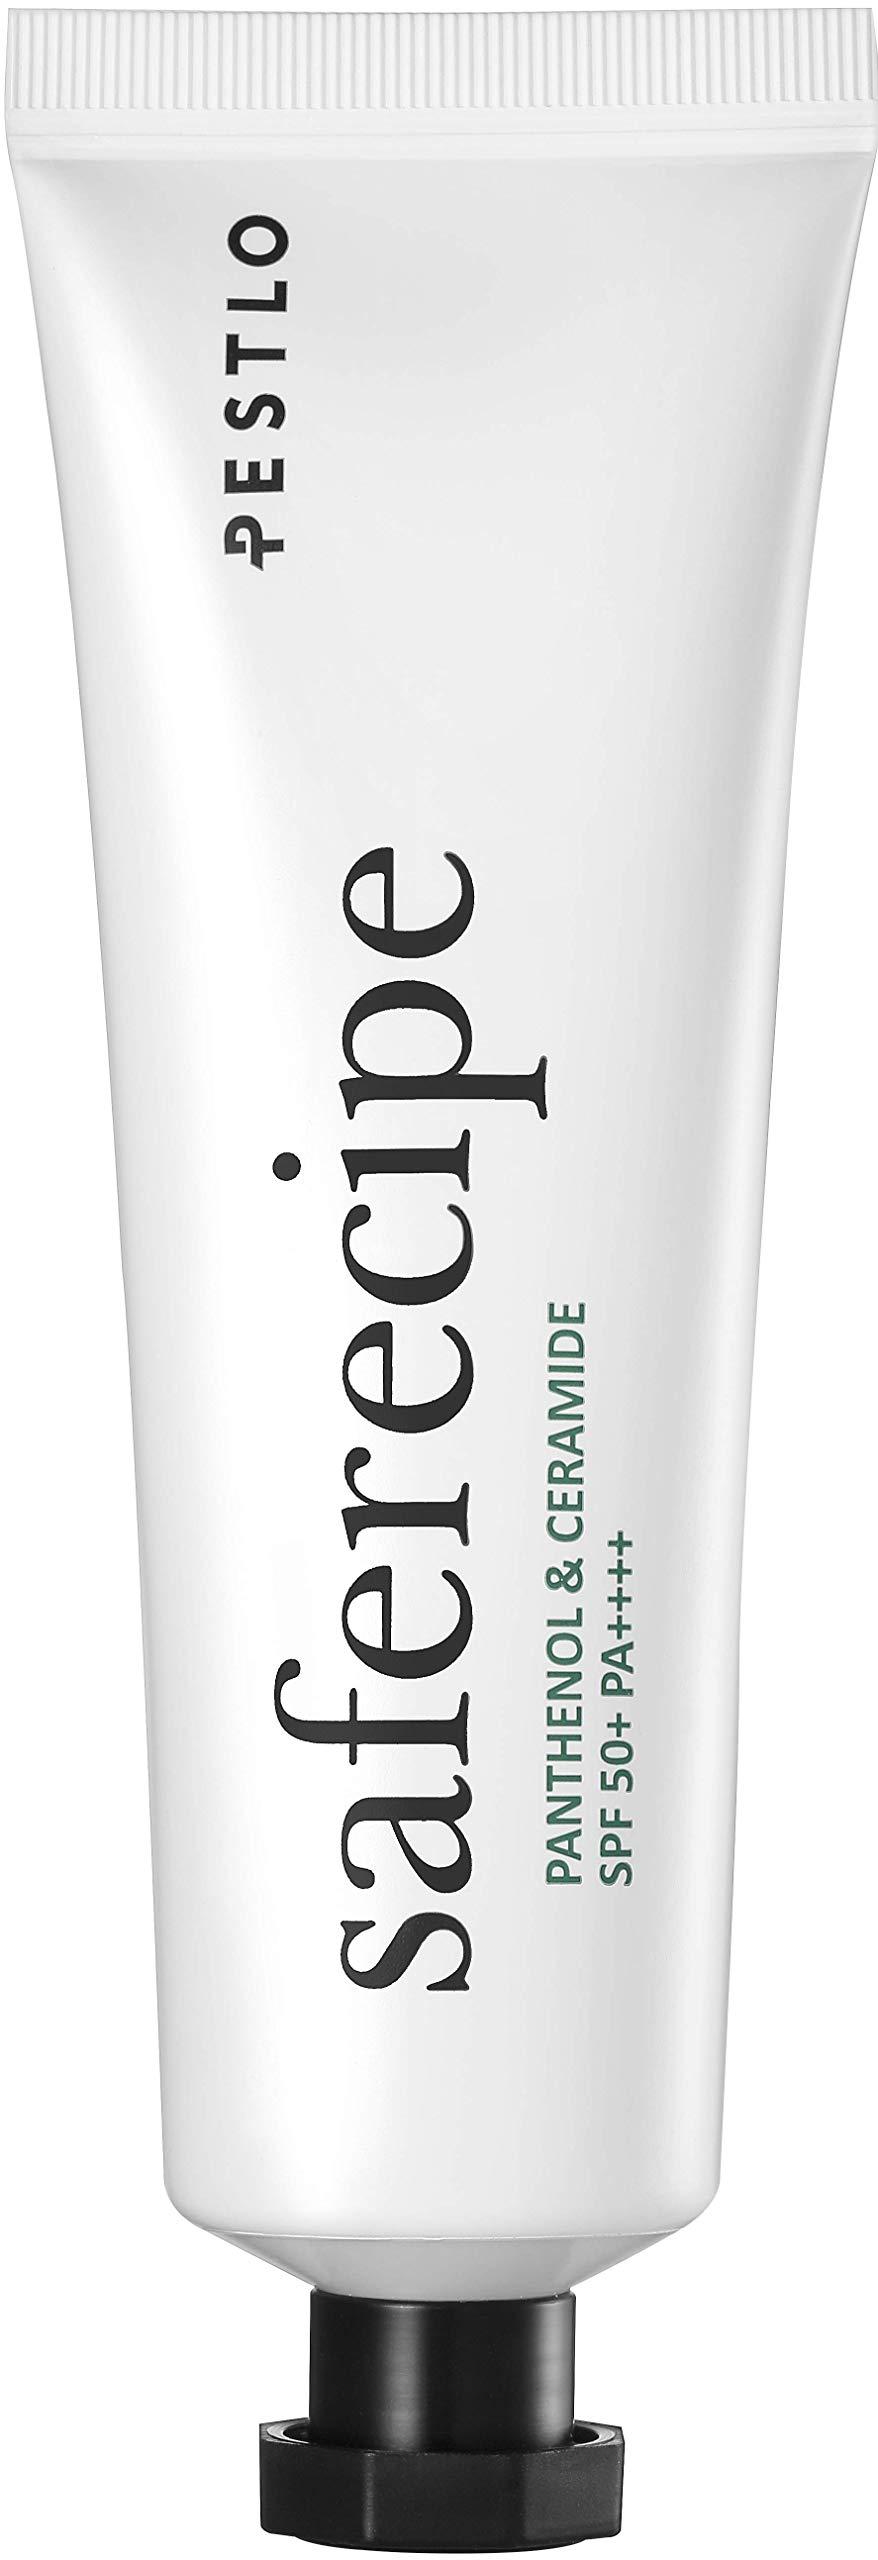 Pestlo Safe Recipe Sun Essence - Natural Facial Sunscreen Moisturizer, Hypoallergenic Korean Cosmetics - 50ml by PESTLO PESTLE+ROAD